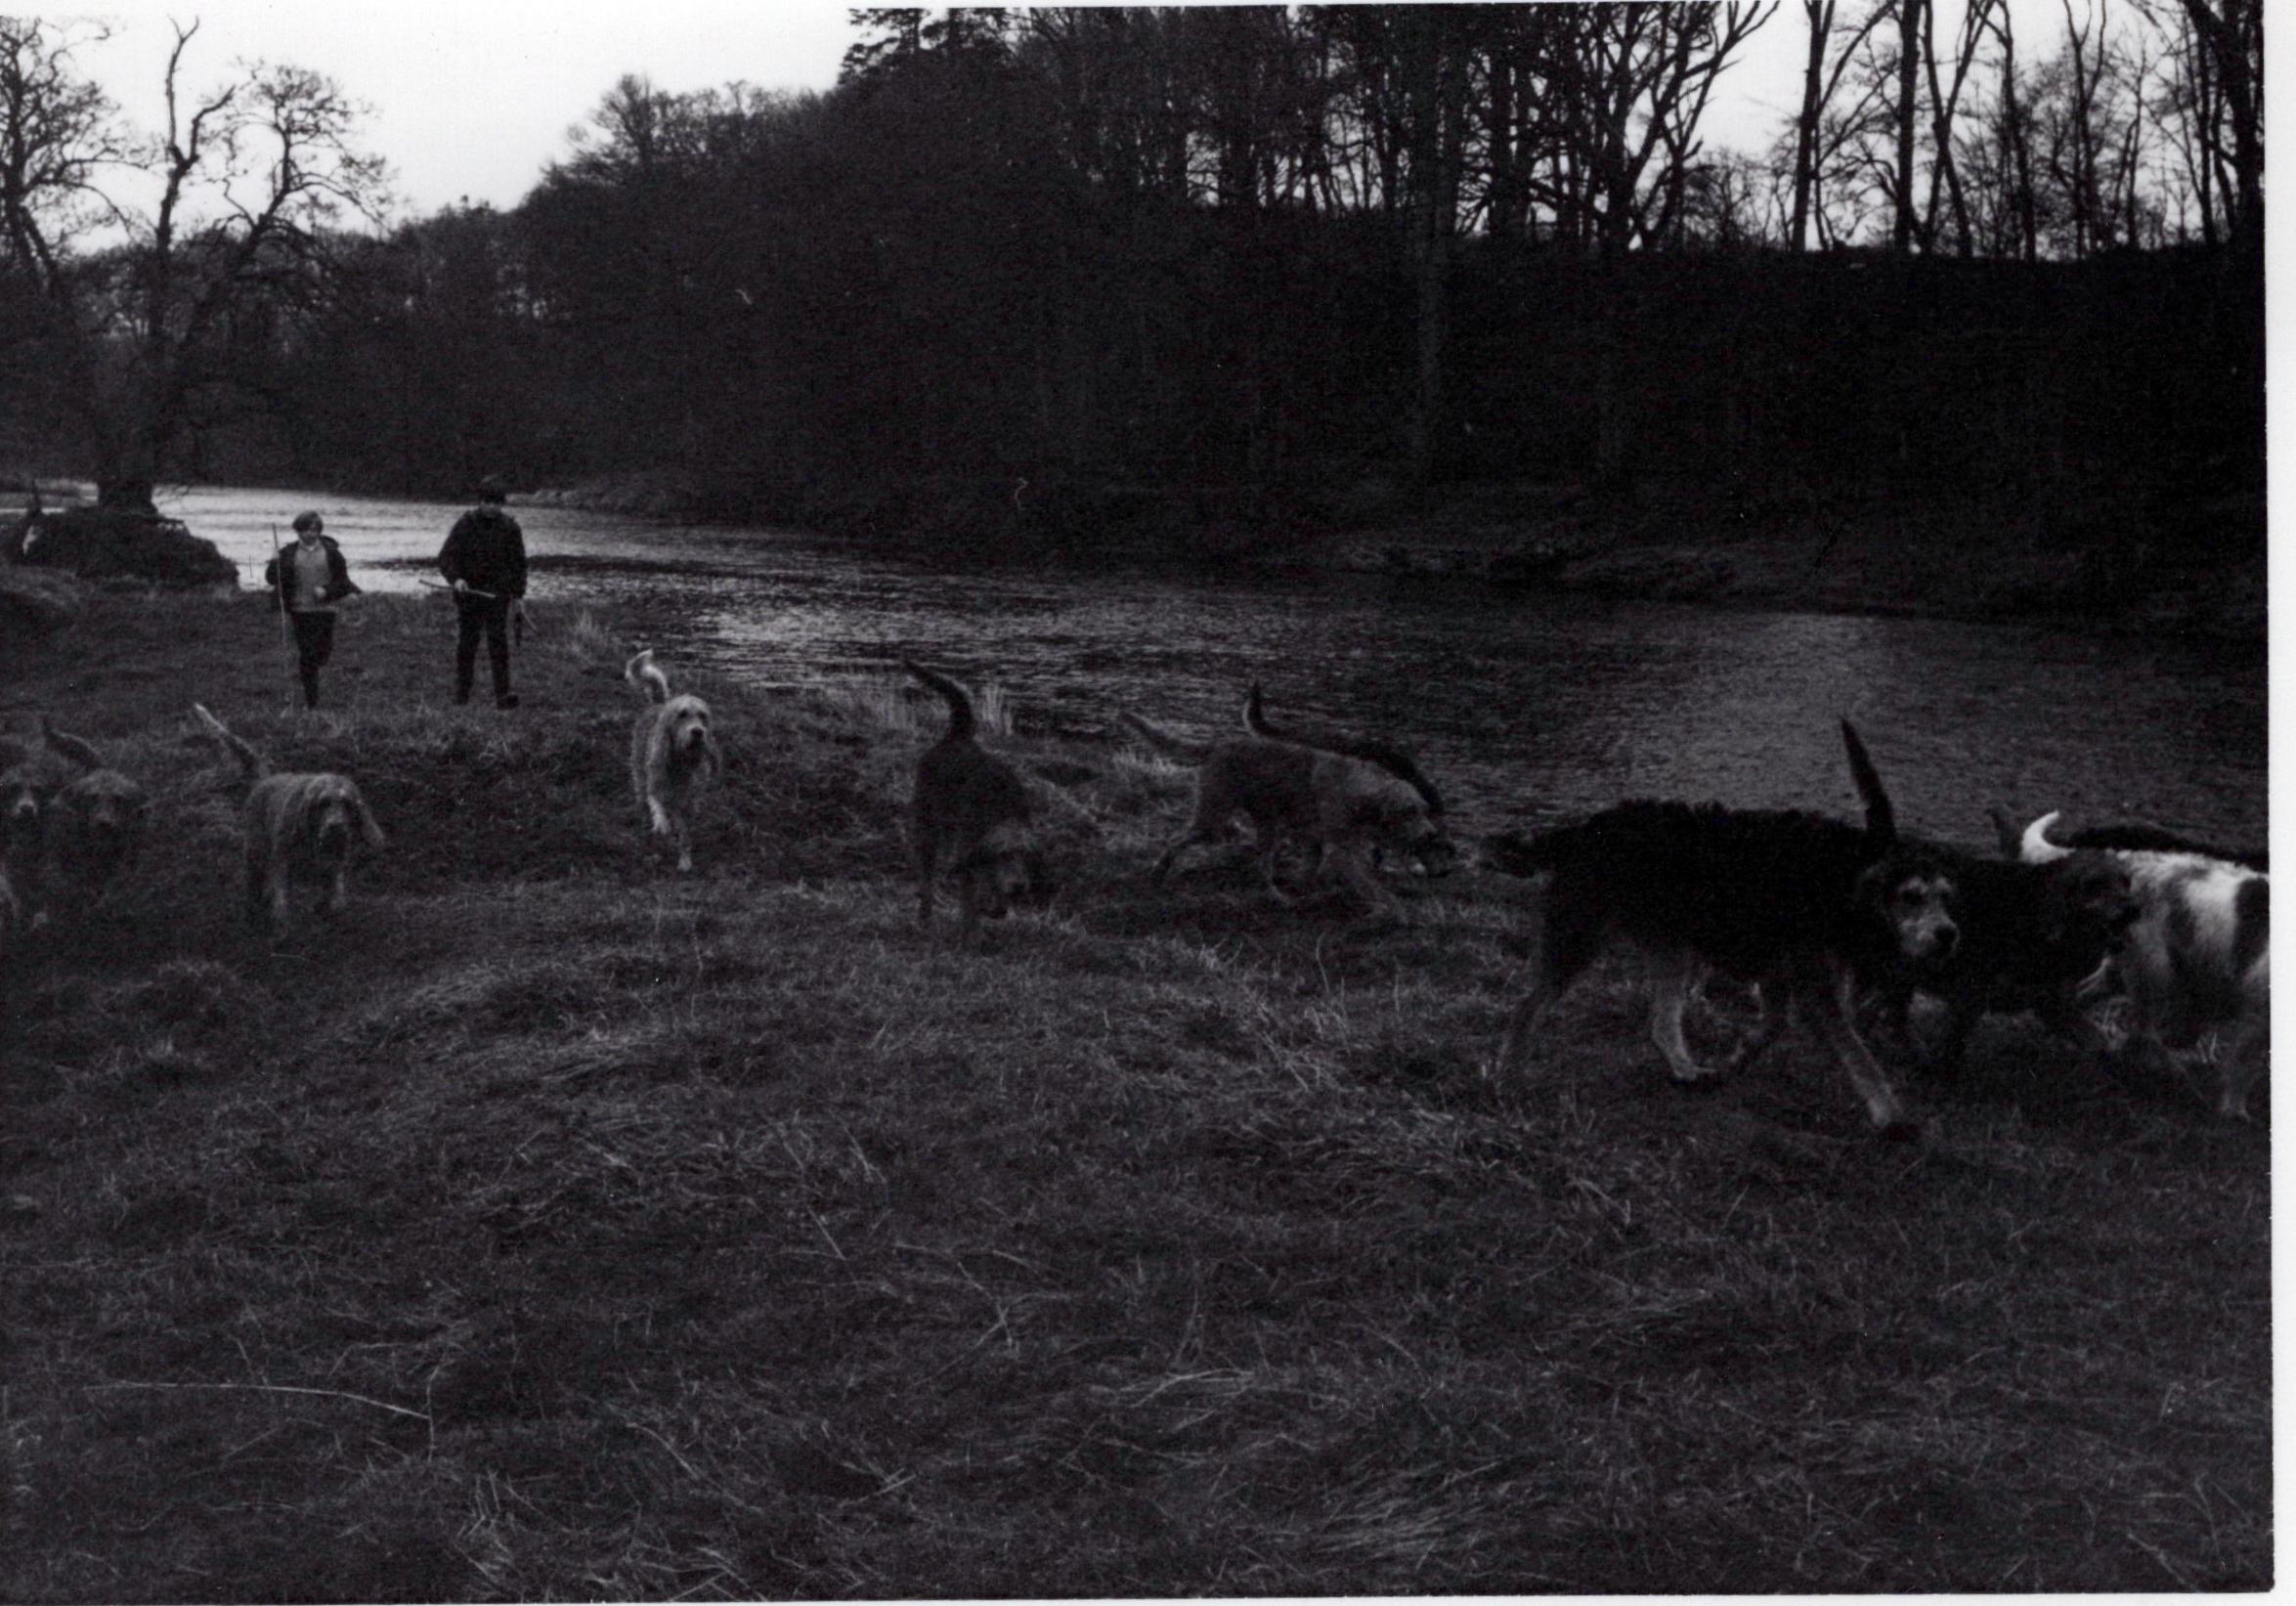 1970_Mei_Otterhound-Schotland_0018_a